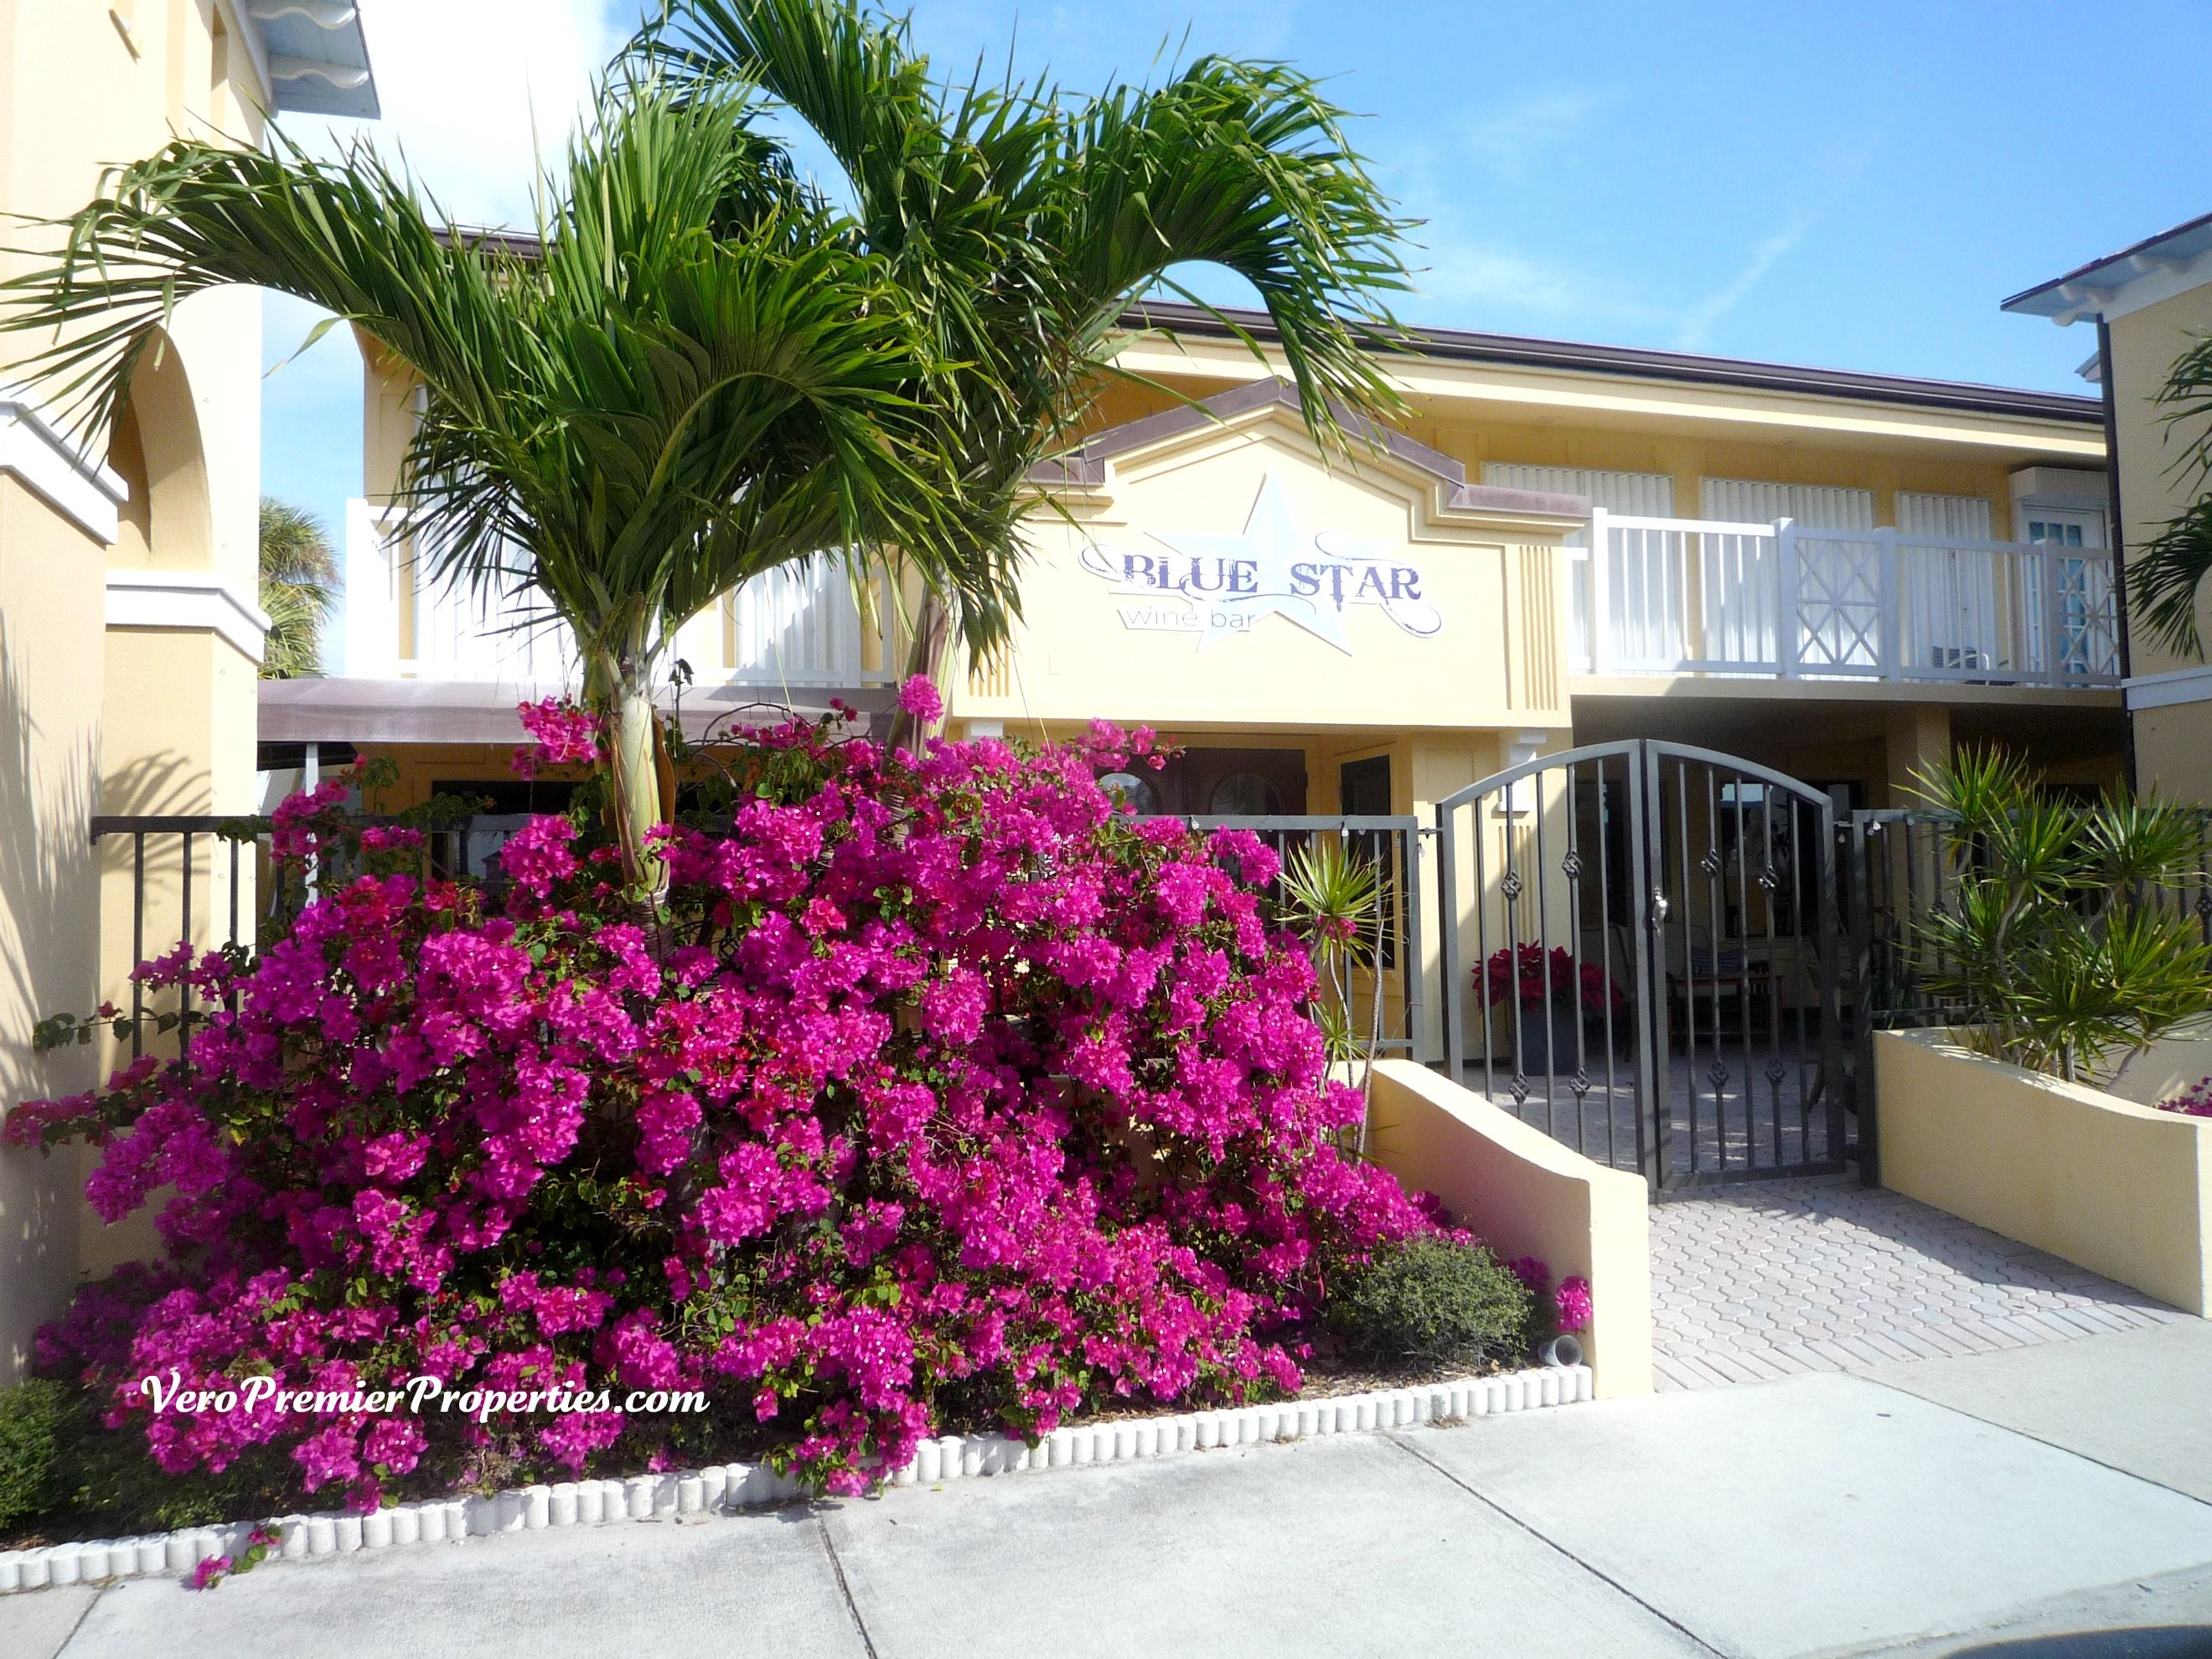 Blue Star Wine Bar Fabulous Vero Beach Pinterest